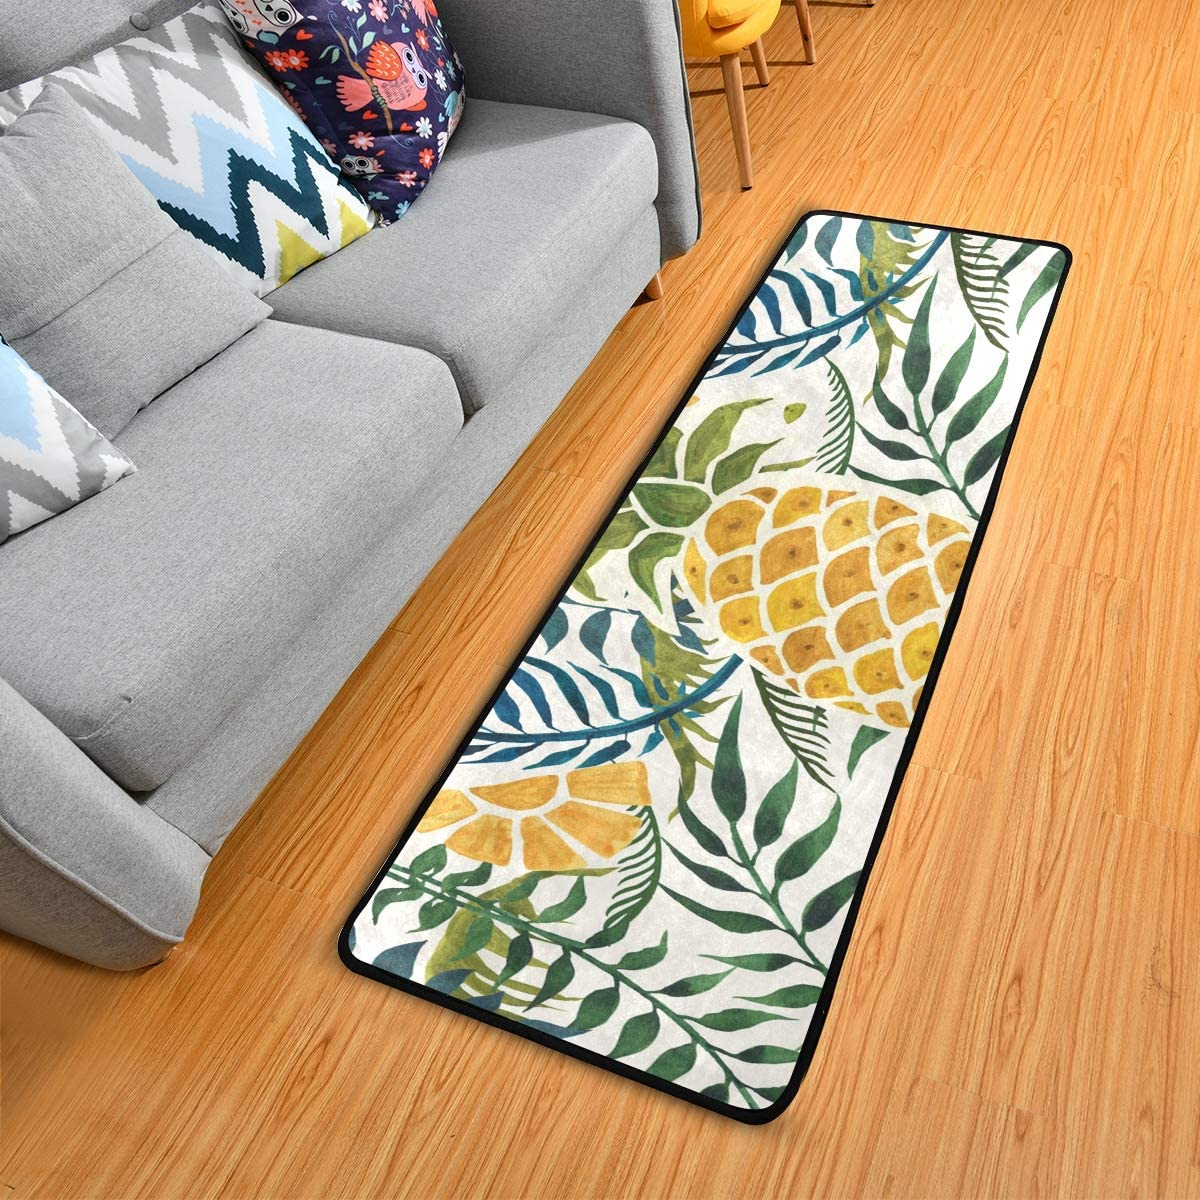 Anti Fatigue Kitchen Floor Mat, Colorful Non Slip Absorbent Comfort Standing Mat Soft Runner Rug for Hallway Entryway Bathroom Living Room Bedroom 72 x 24 in (Tropical Pineapple)